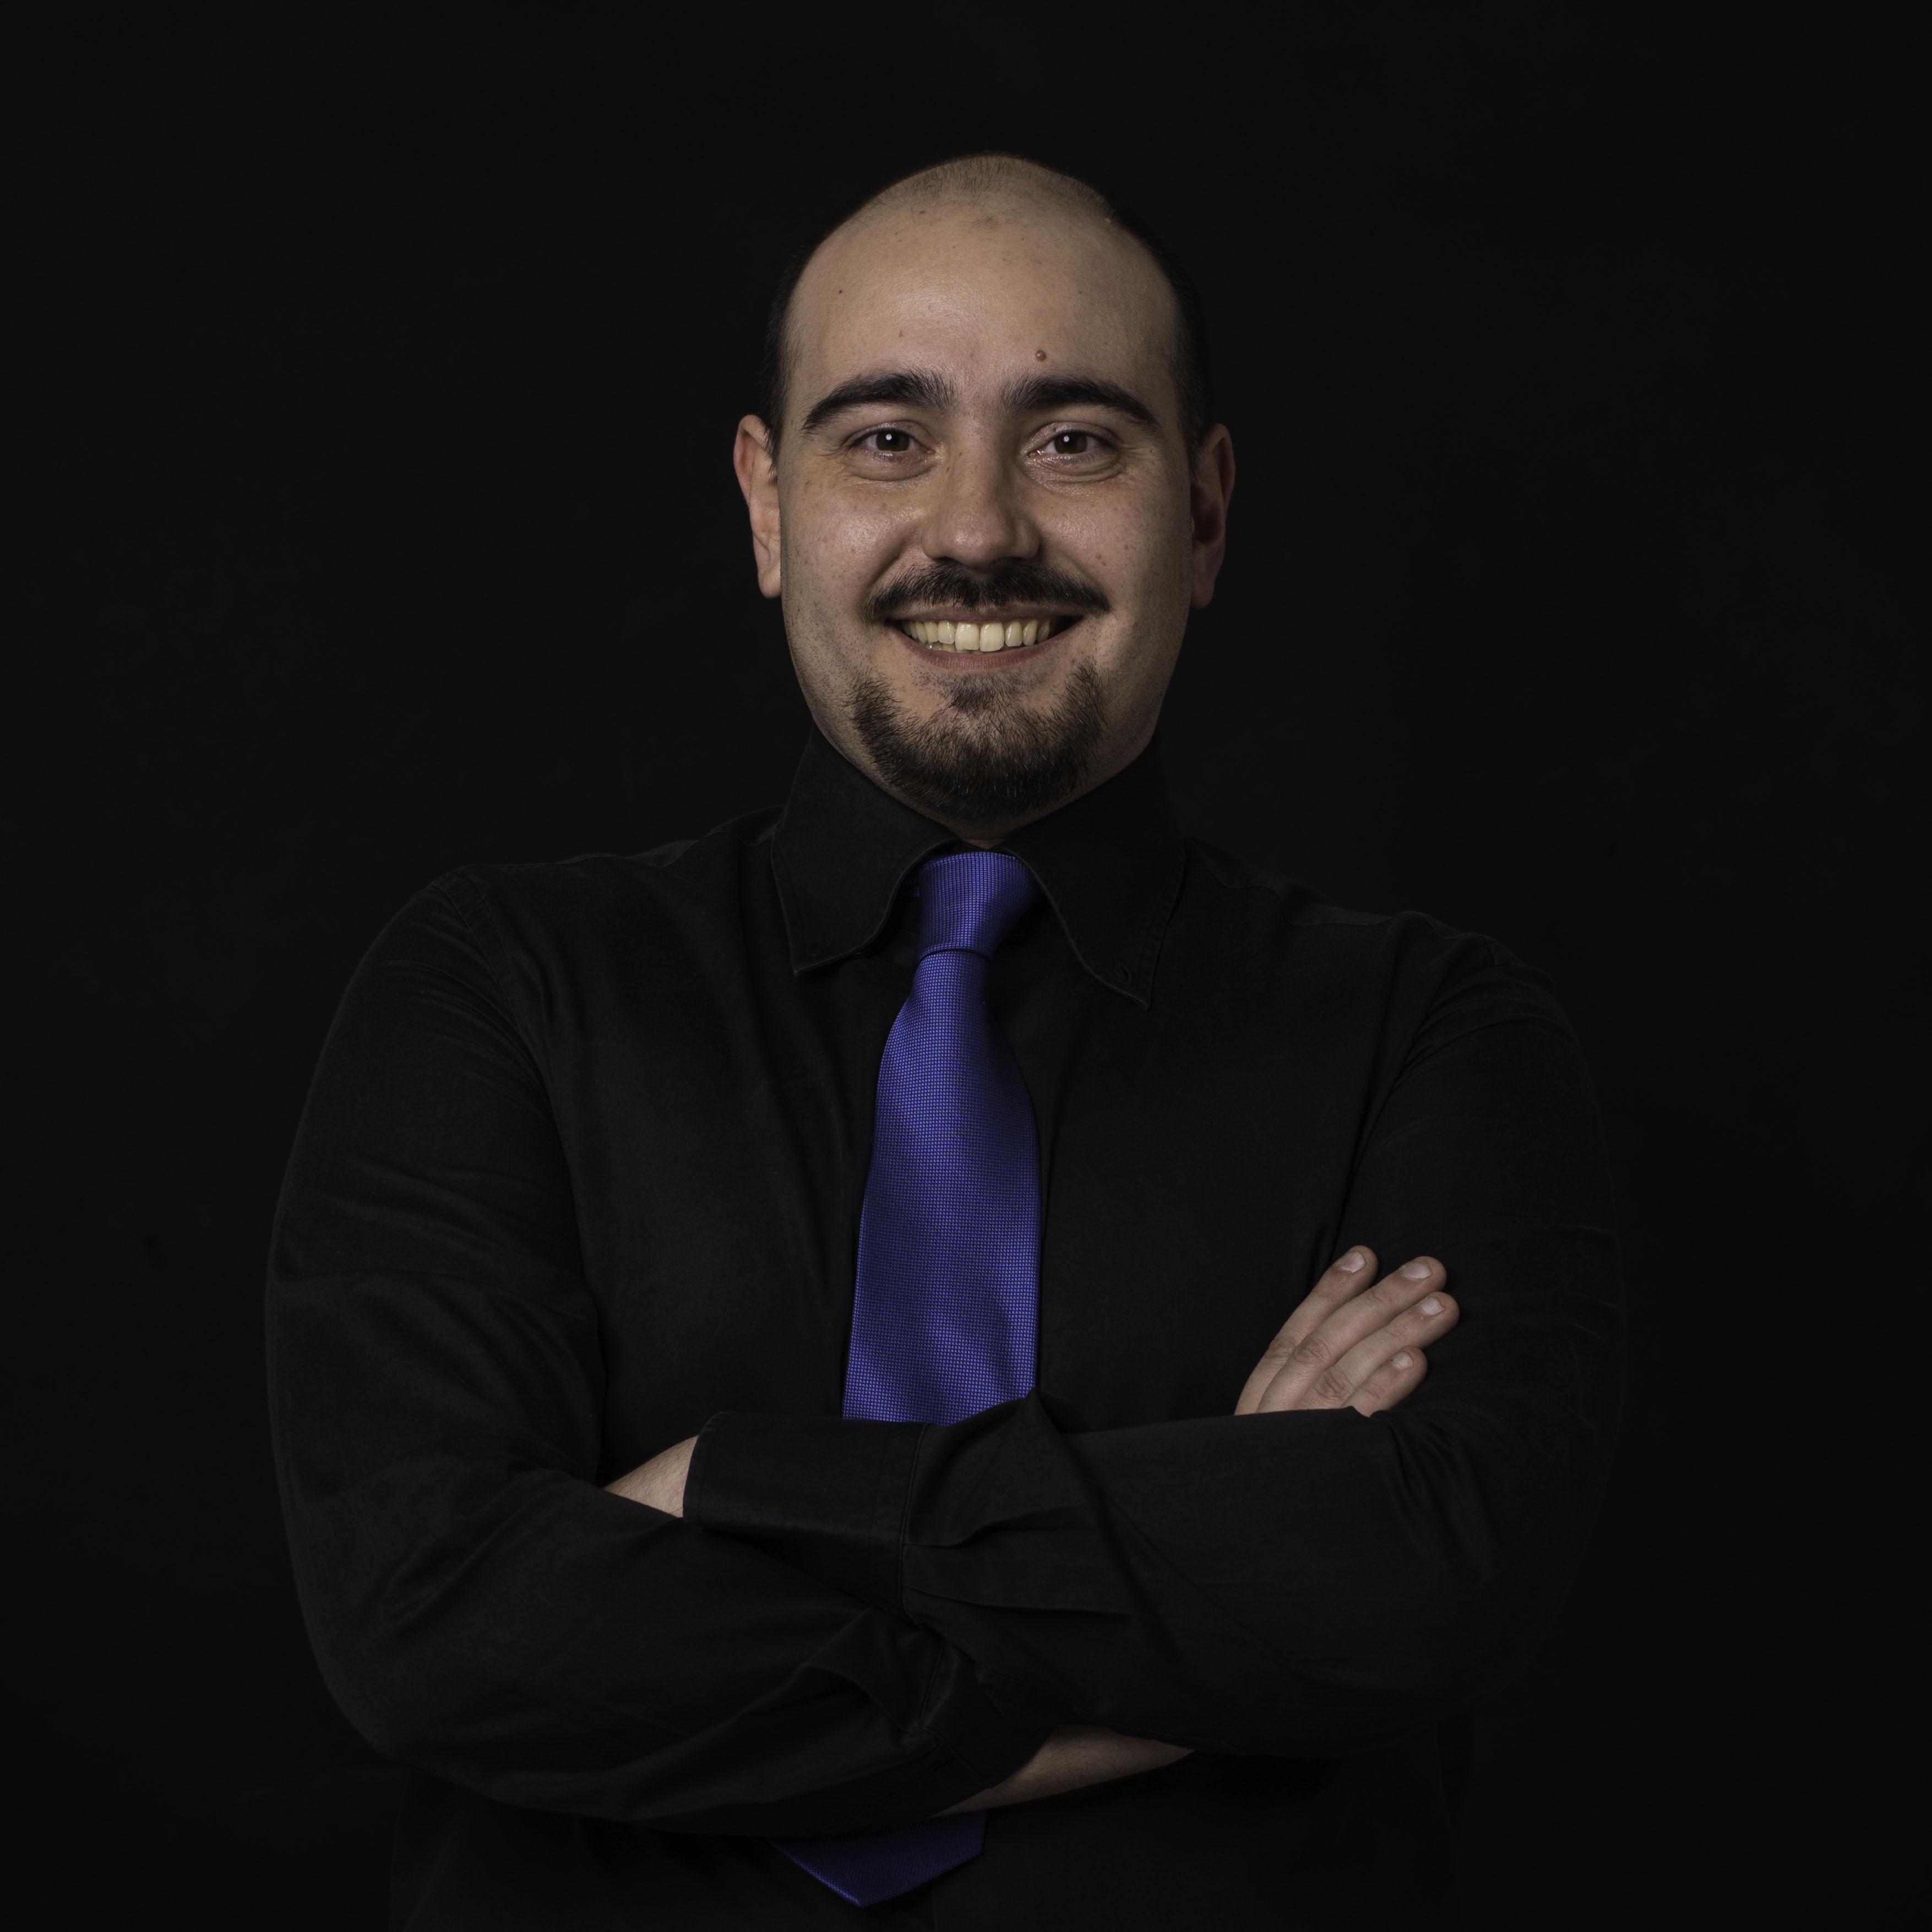 Emanuele Ceripa